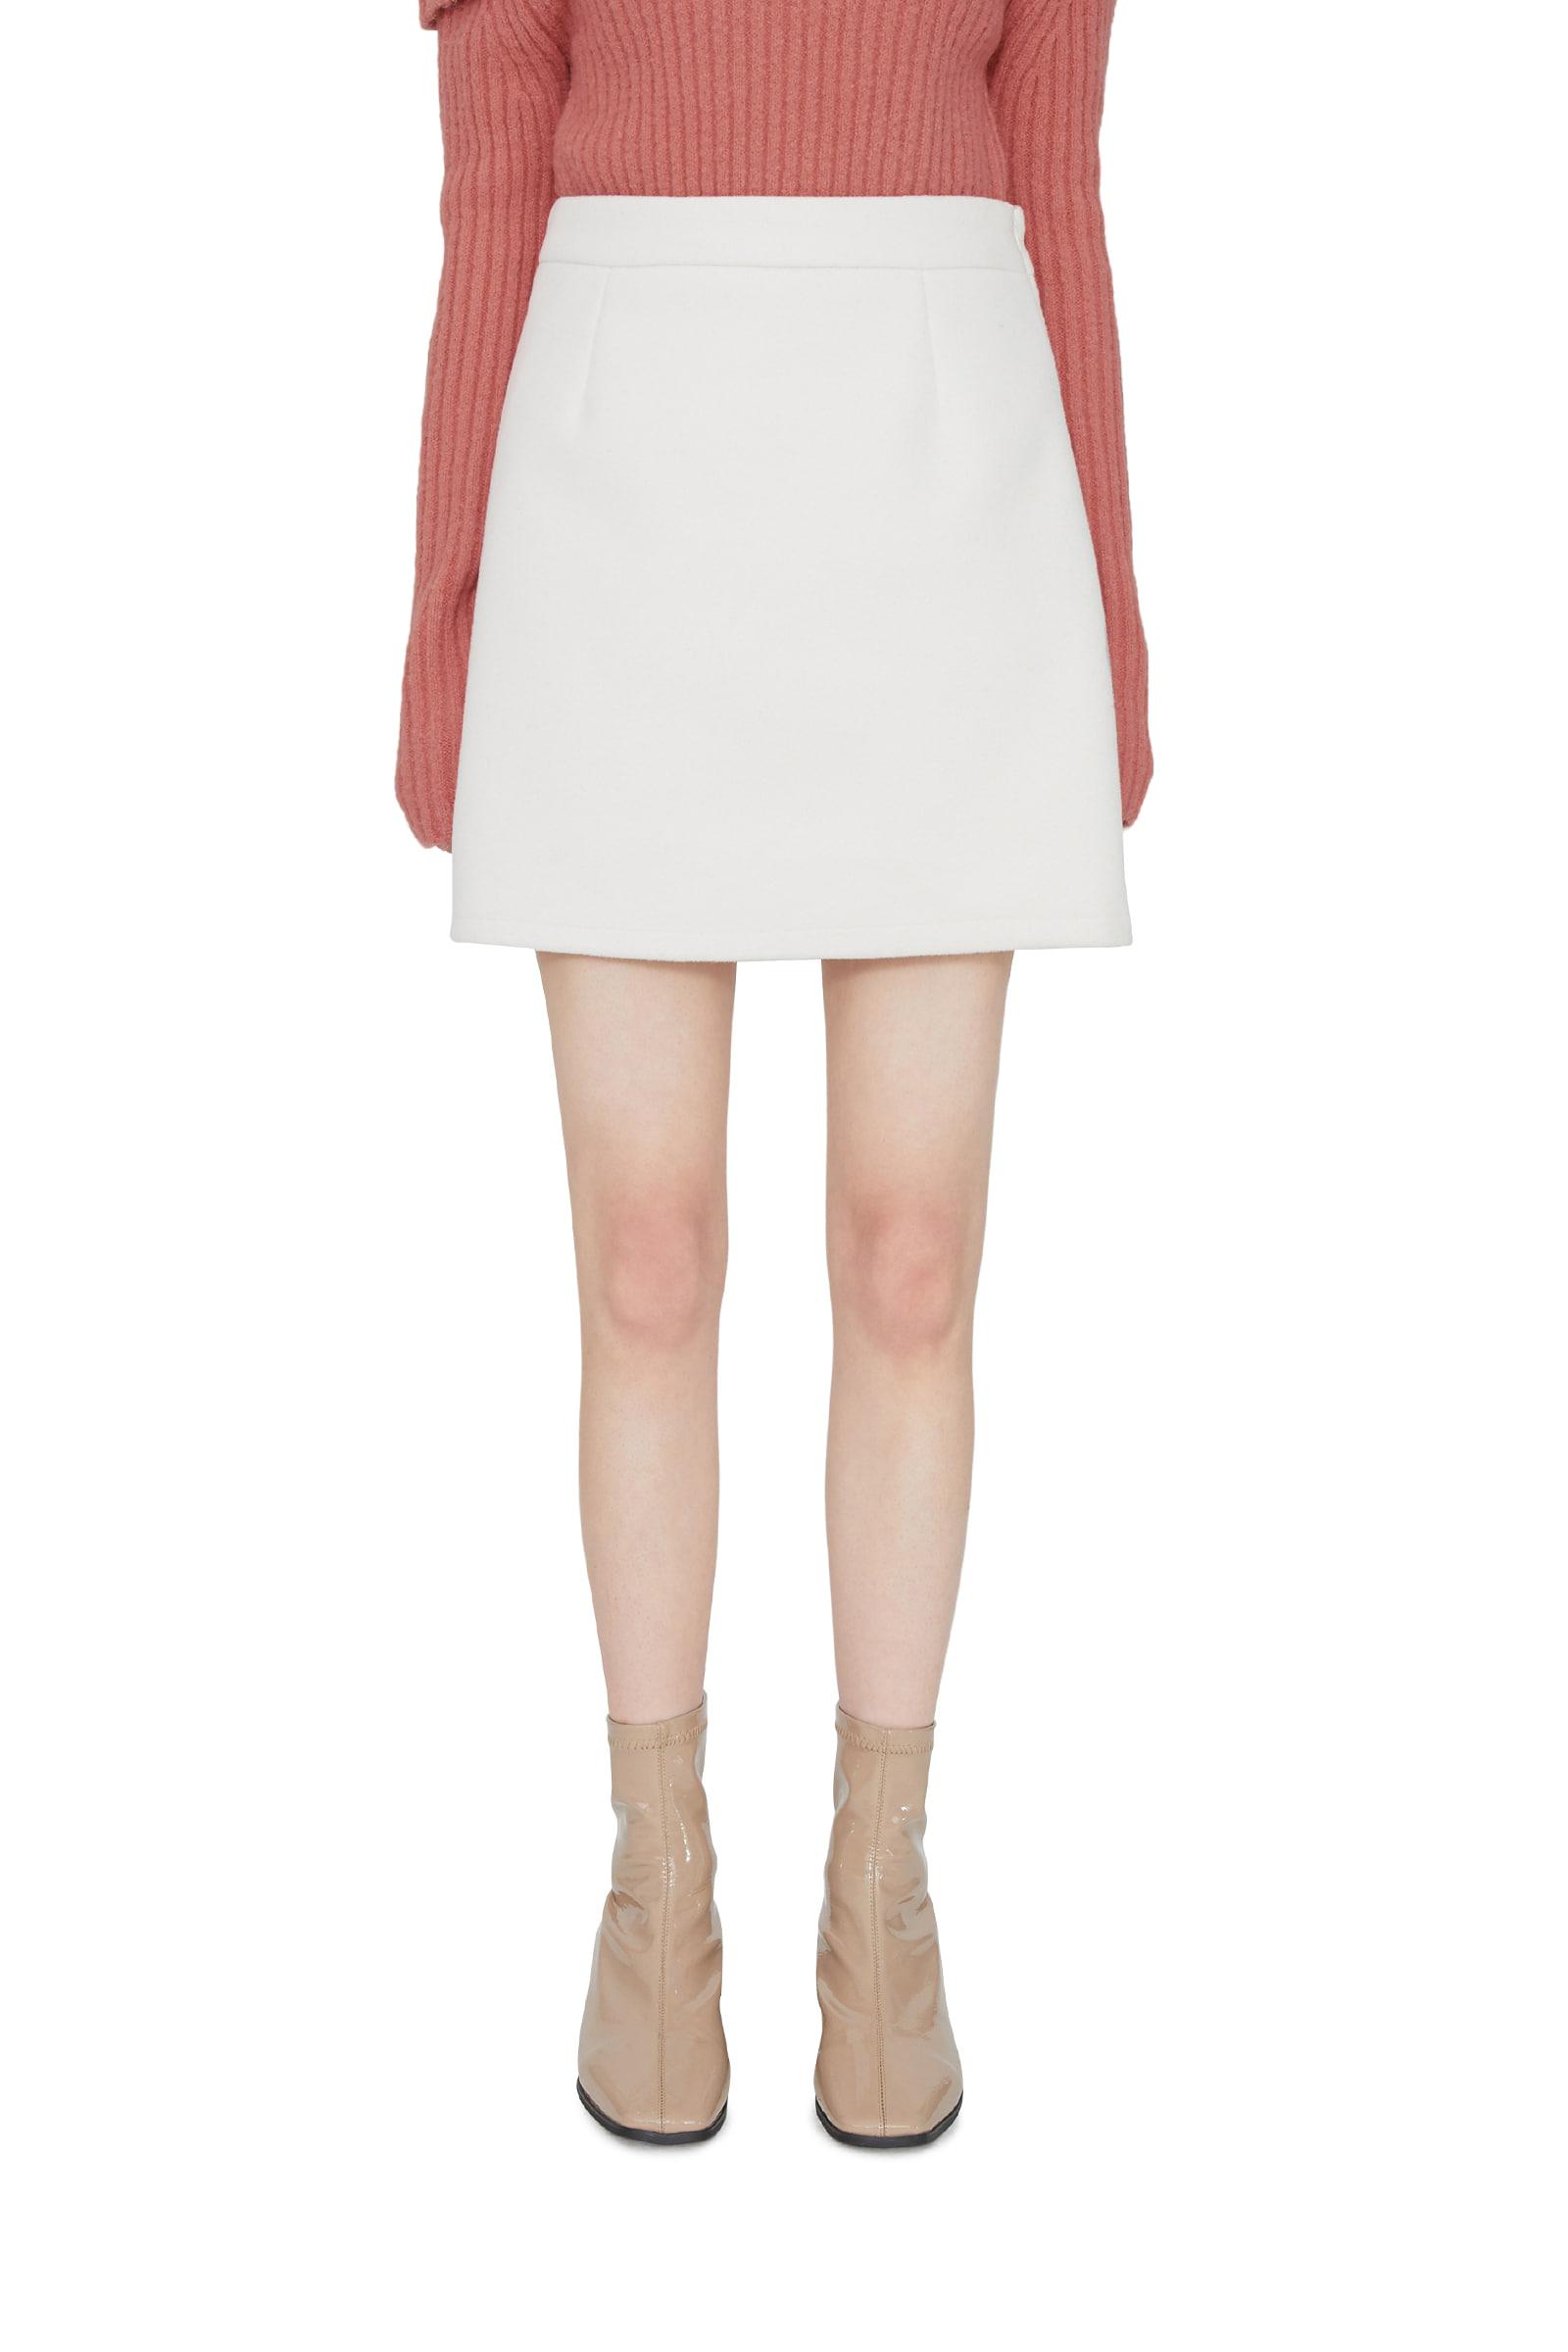 Dave mini skirt